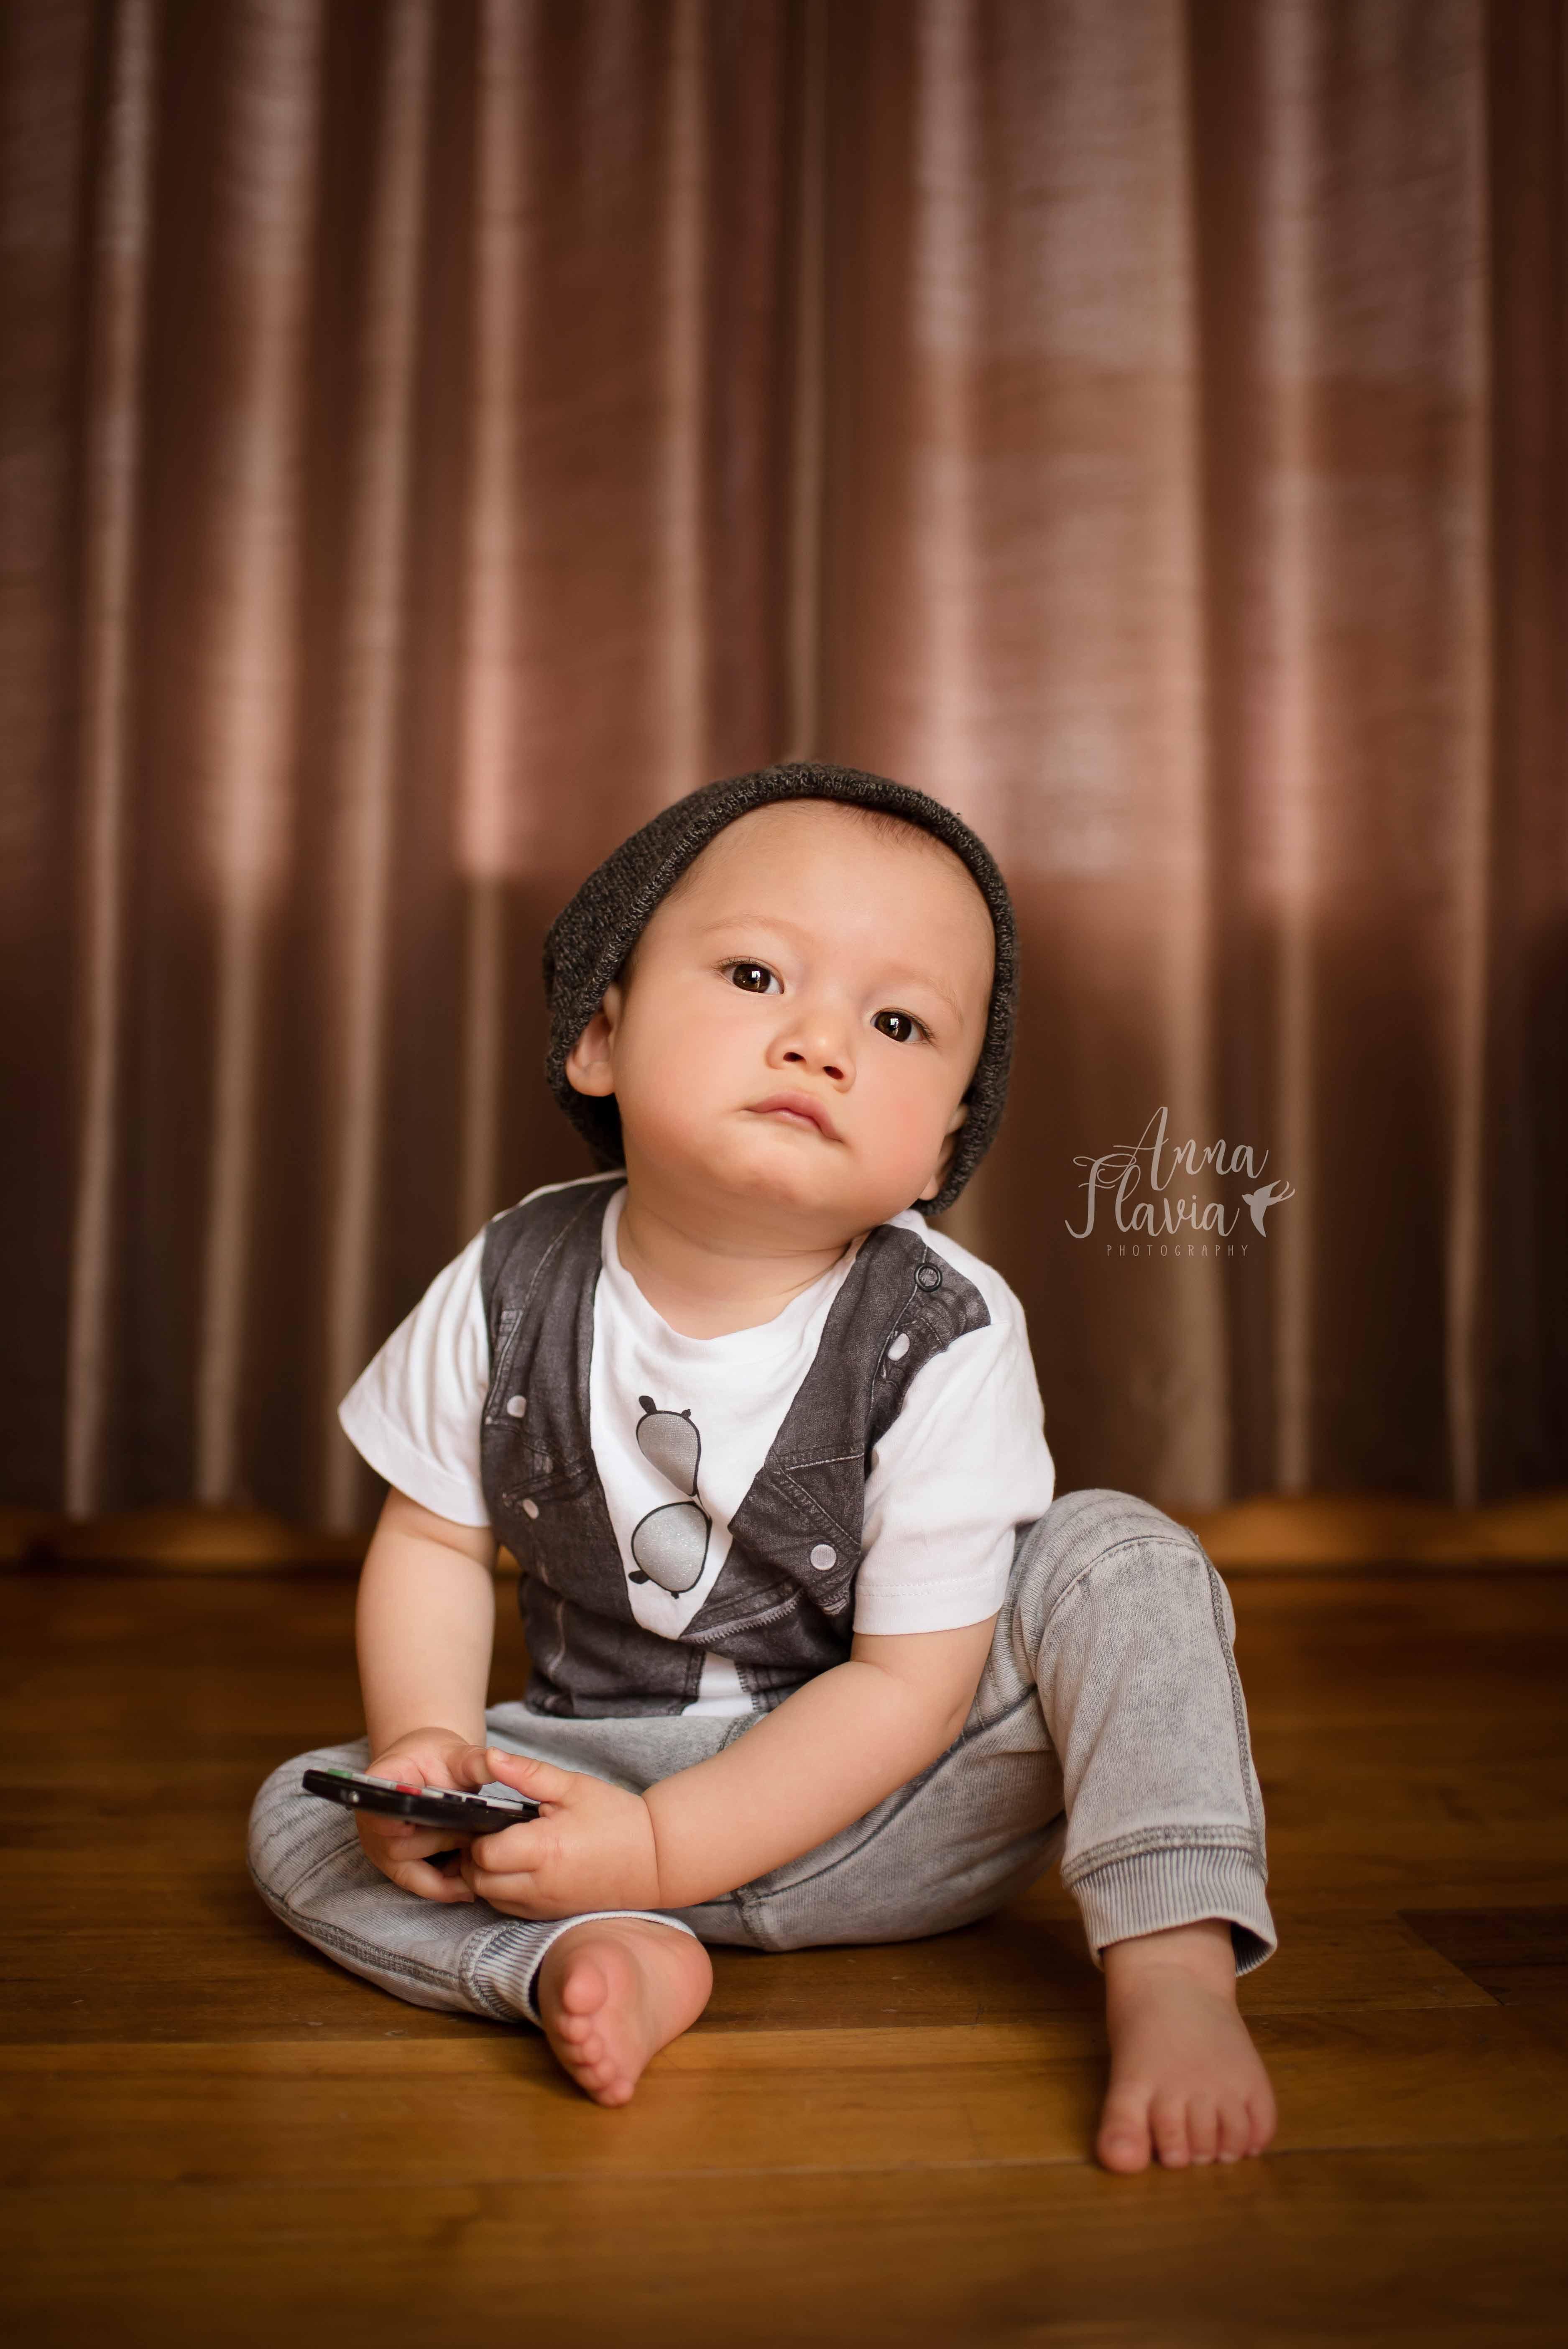 photographer_dublin_anna_flavia_children_baby_newborn_family_4